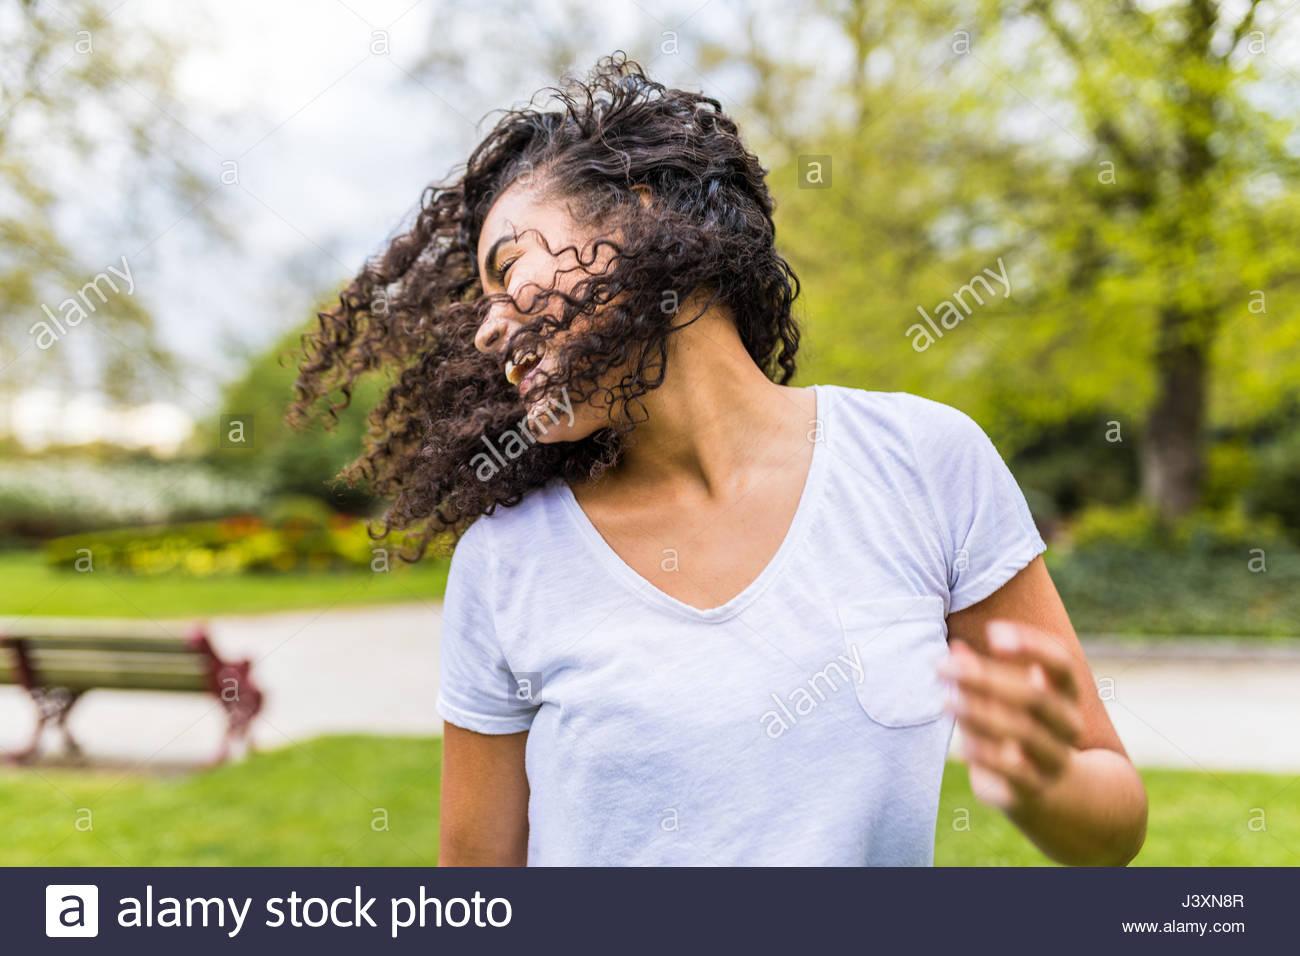 Junge Frau mit langen, lockigen Haar tanzen in Battersea Park Stockbild